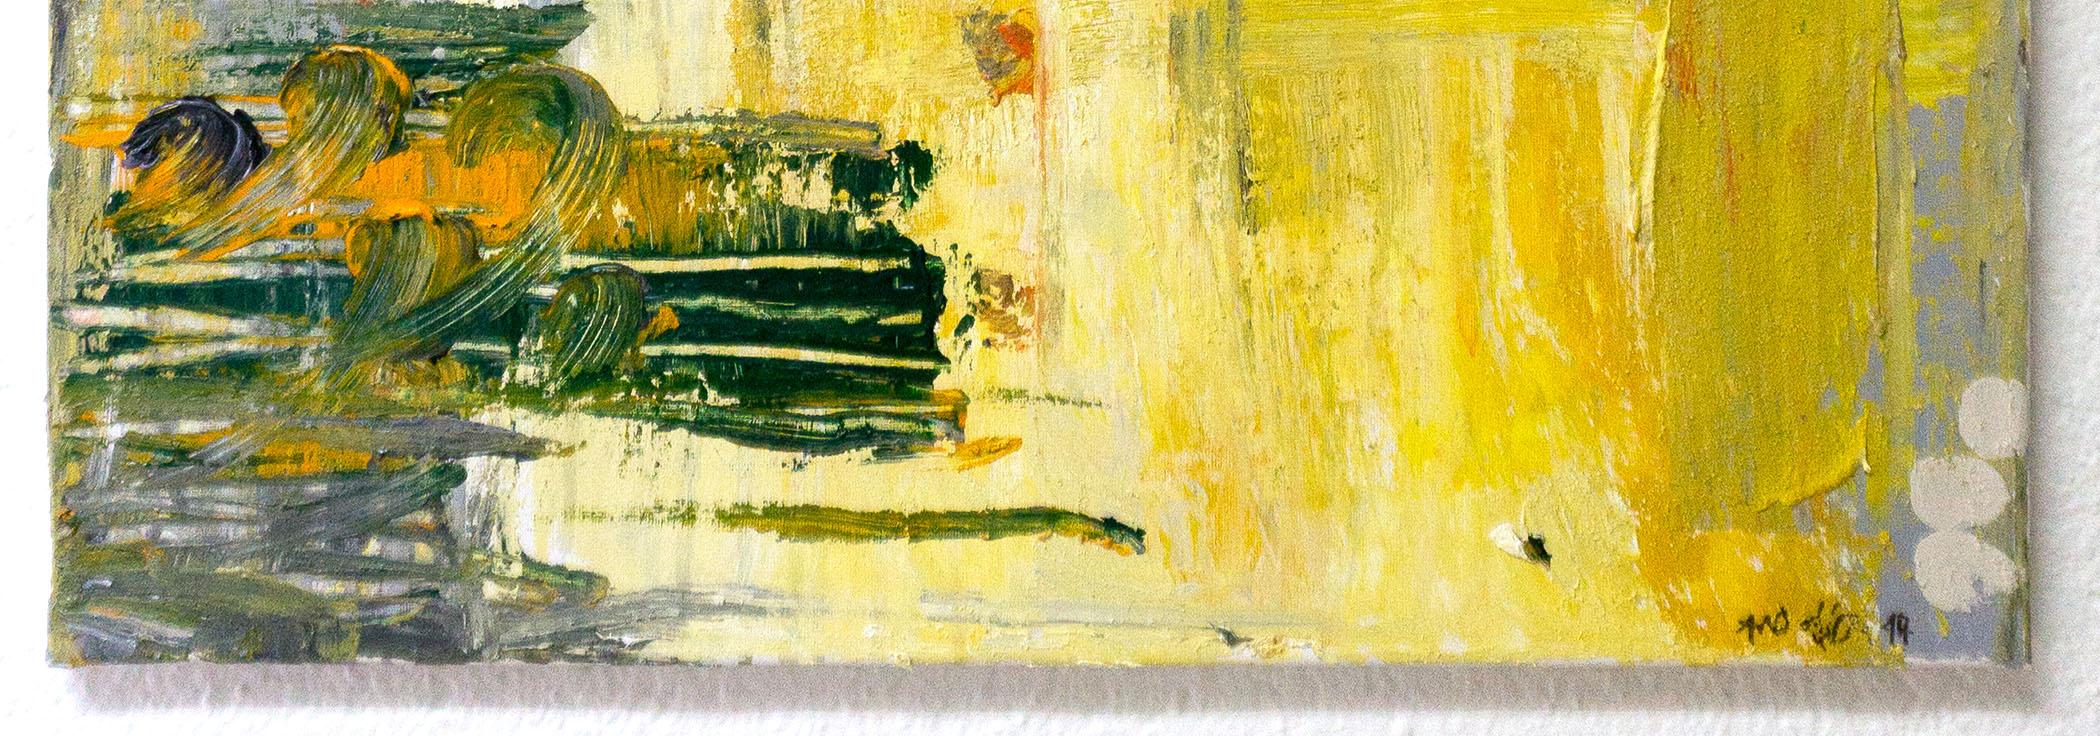 Exposición de pintura en el Centro Cultural Moncloa